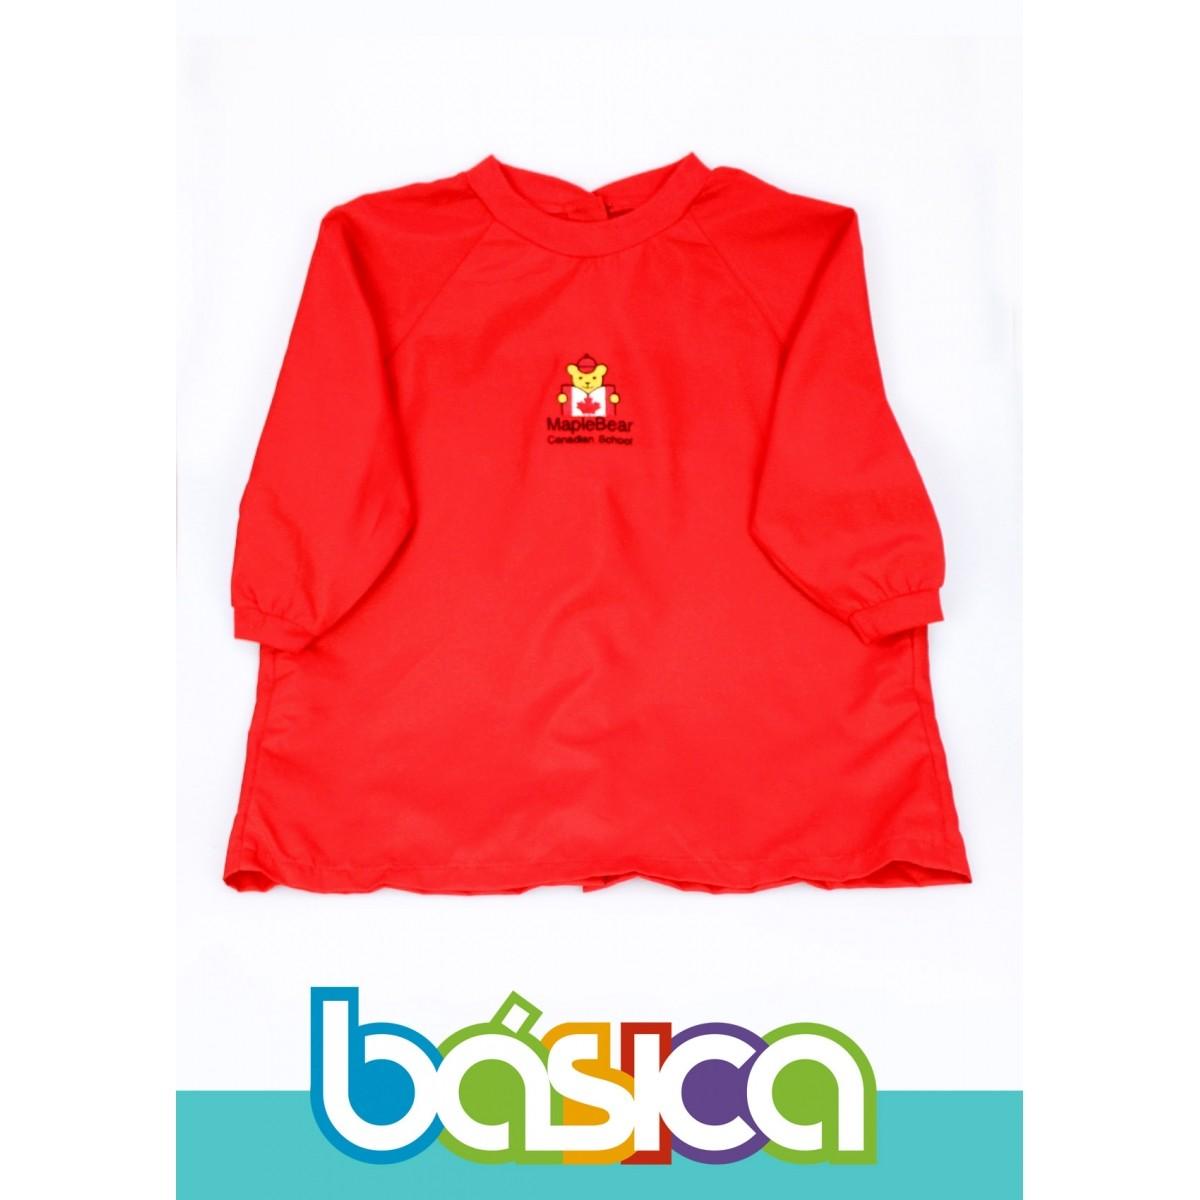 Avental Uniforme Maple Bear Infantil  - BÁSICA UNIFORMES